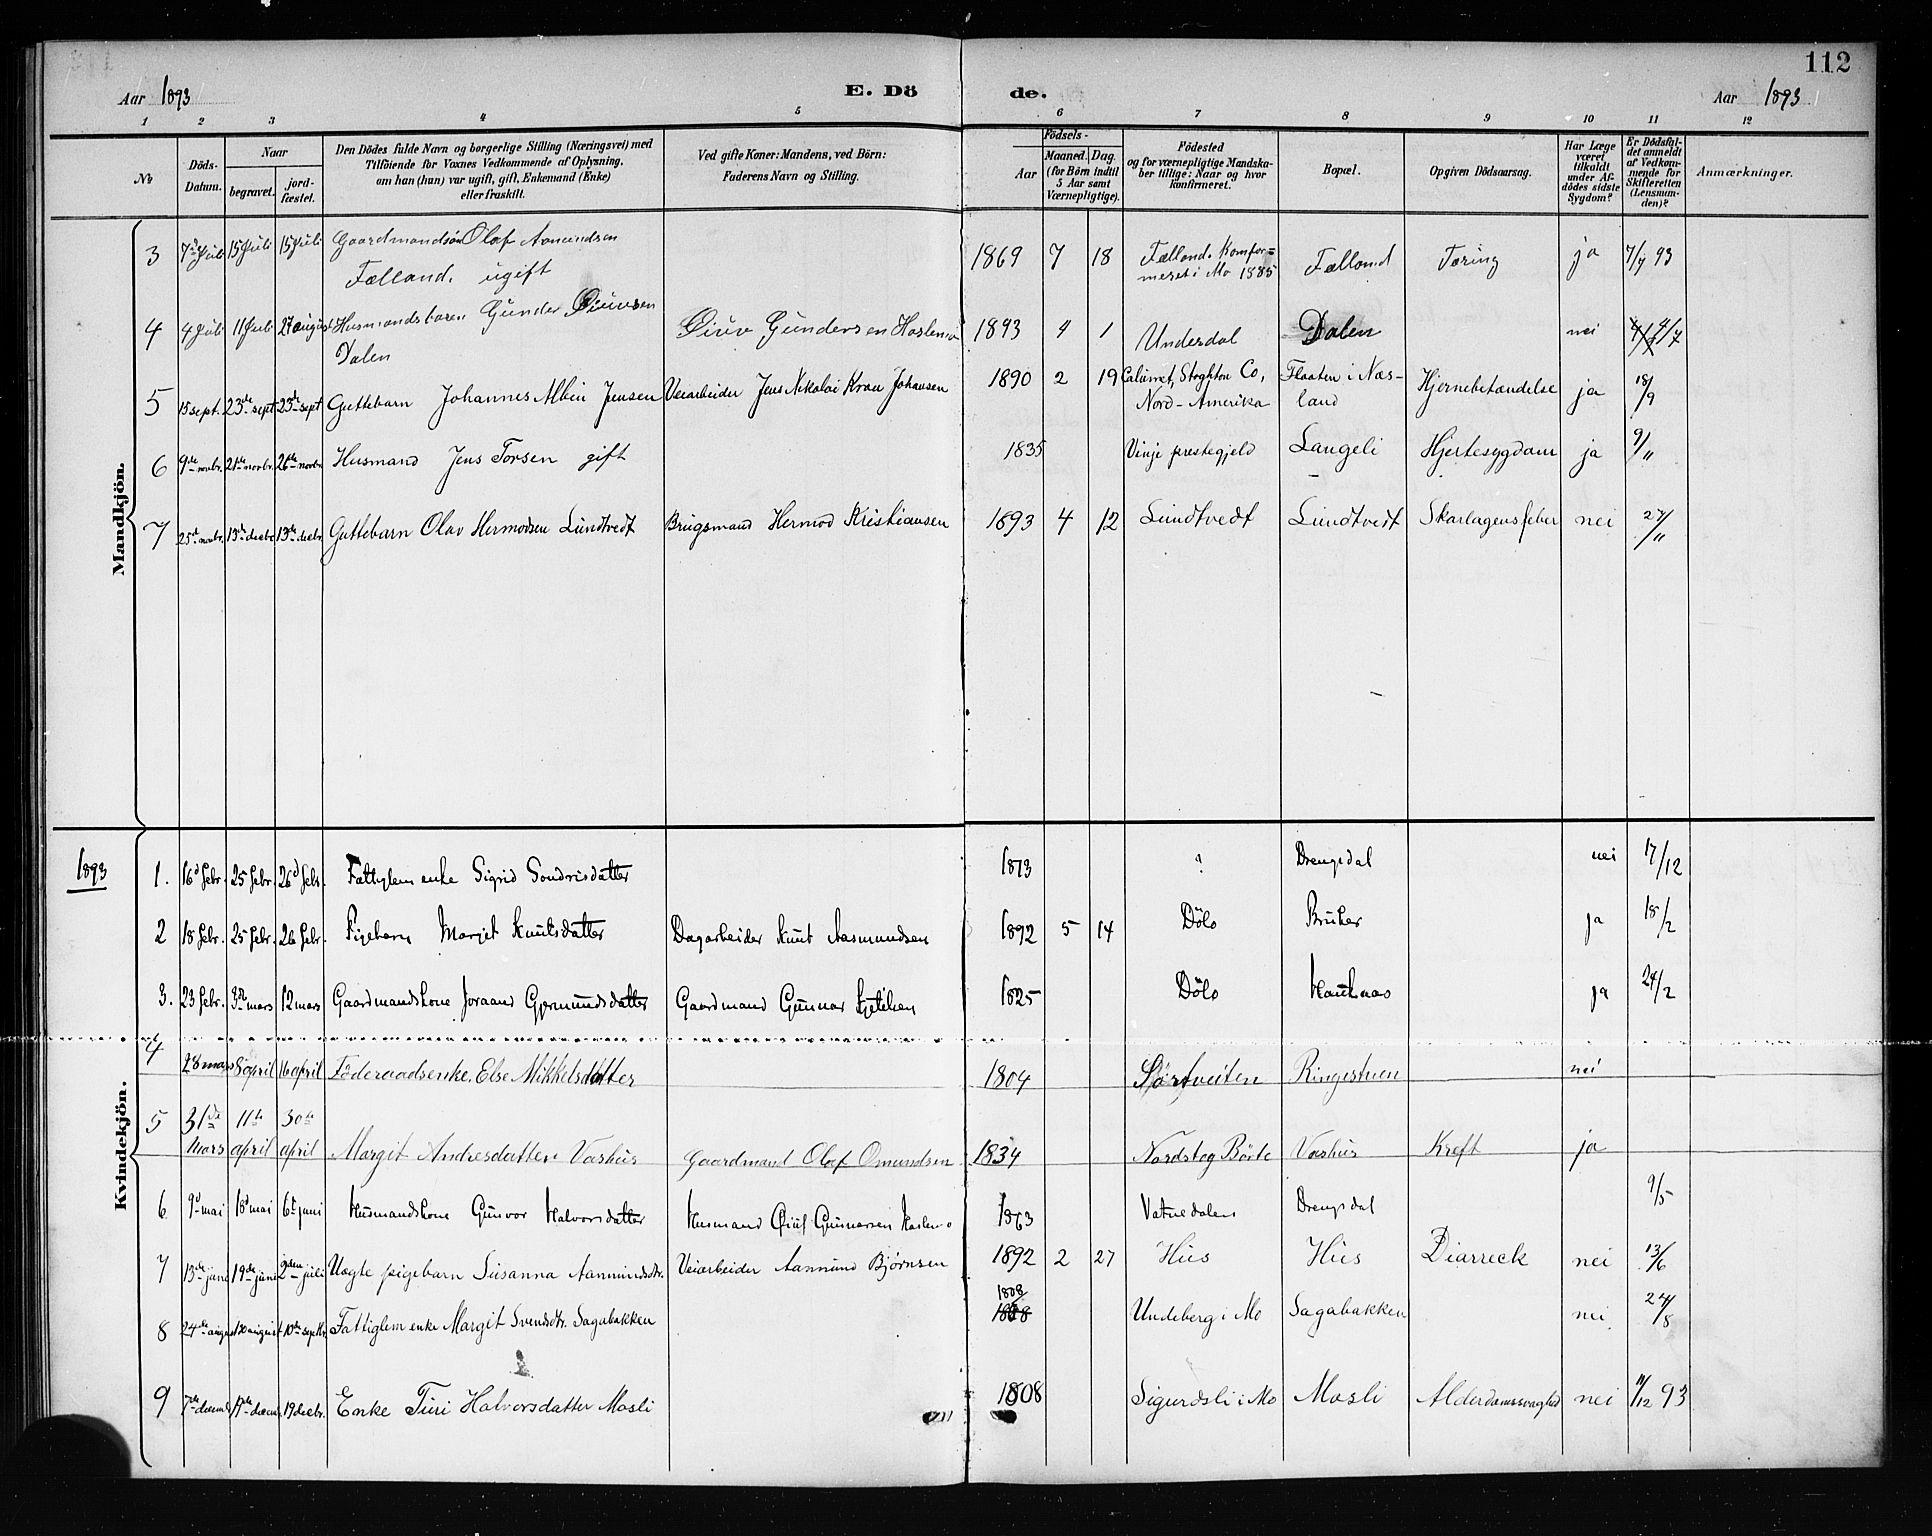 SAKO, Mo kirkebøker, G/Ga/L0002: Klokkerbok nr. I 2, 1892-1914, s. 112